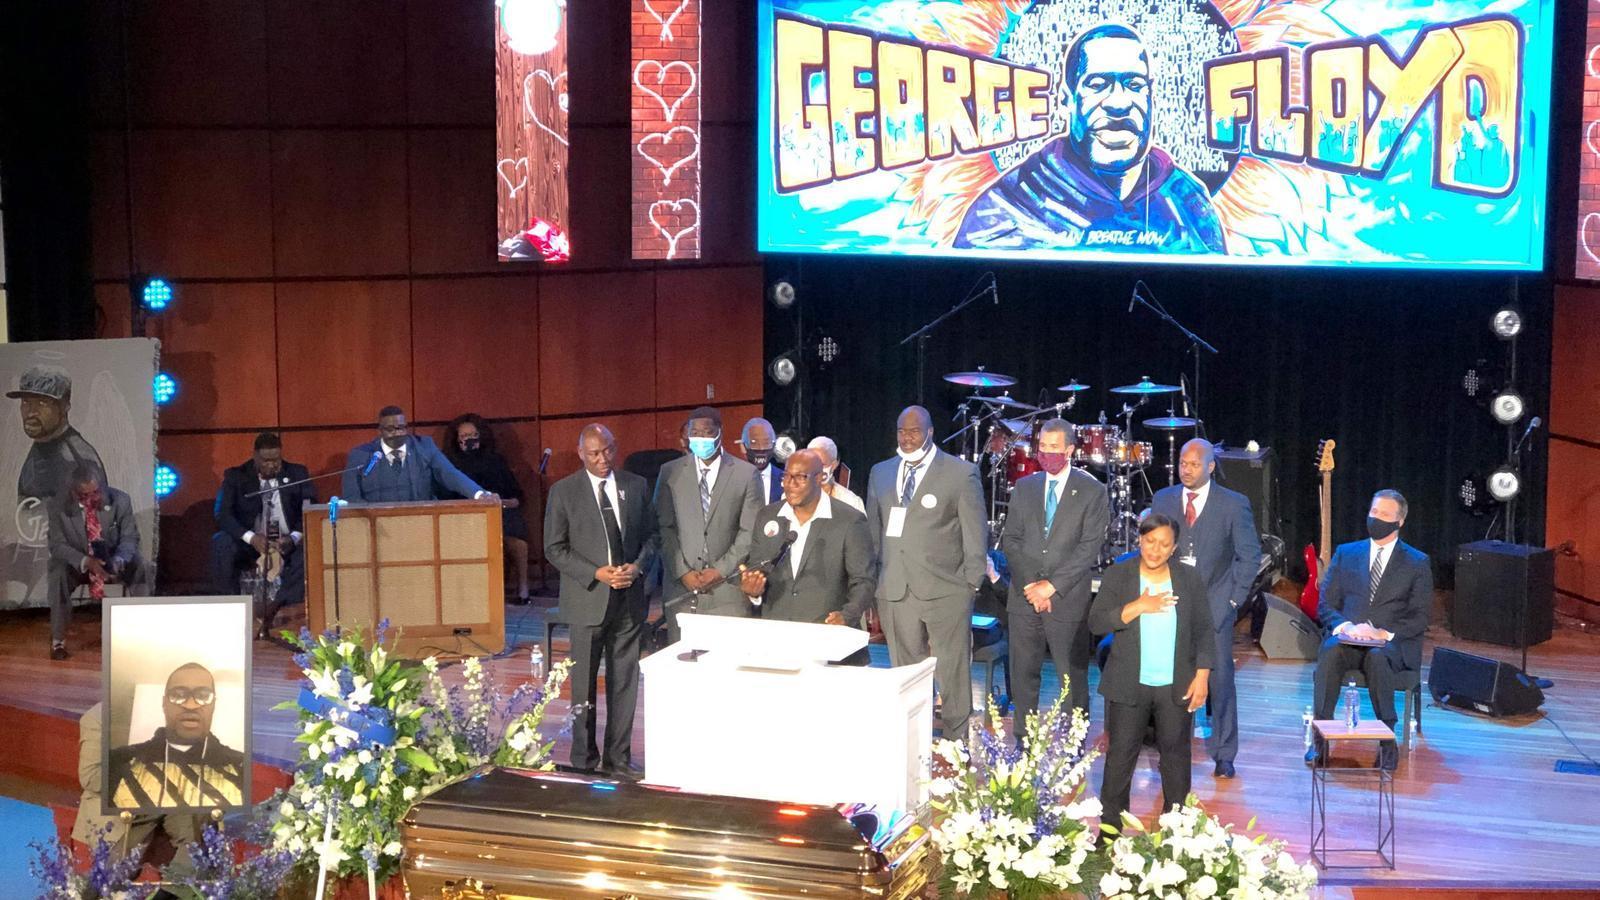 Acte en memòria de George Floyd, aquest dijous a Minneapolis